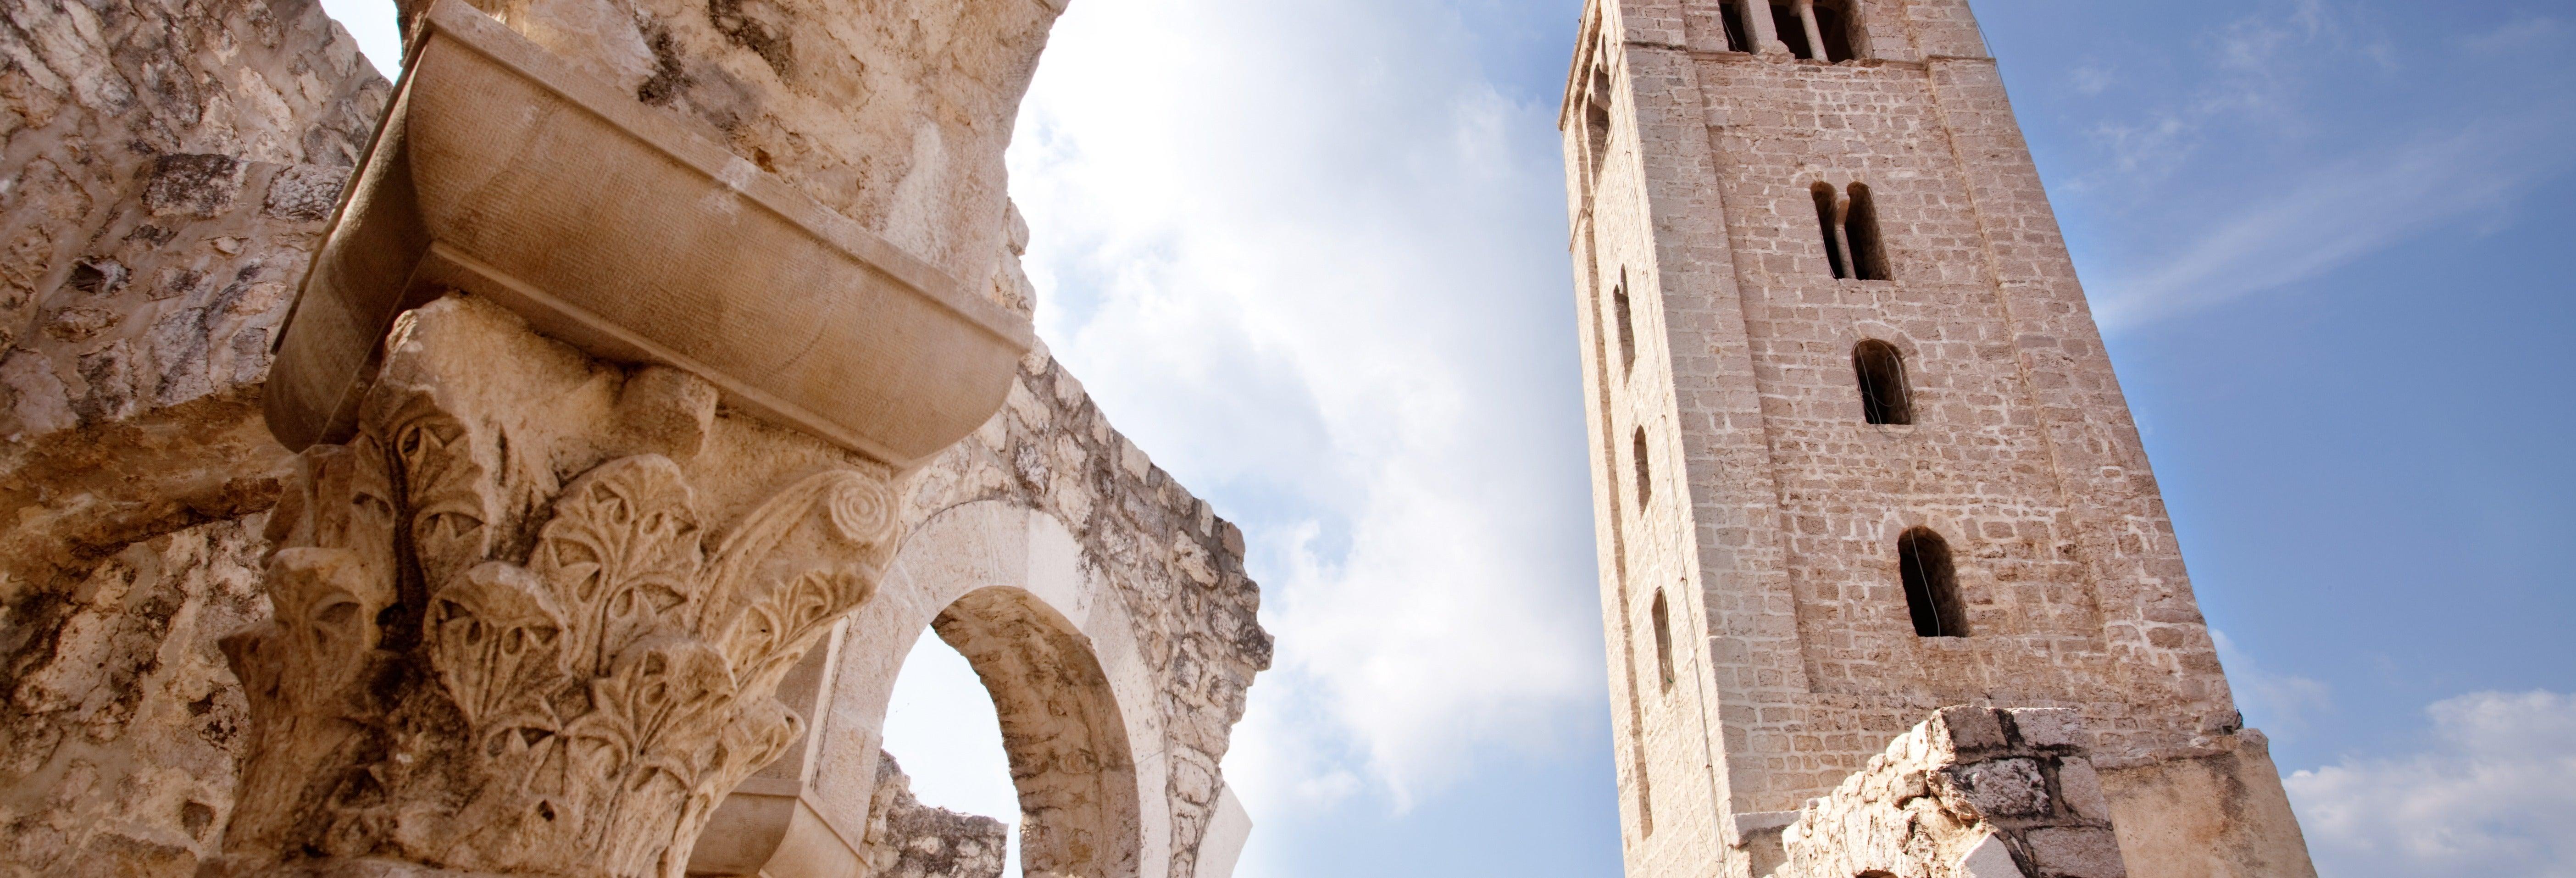 Christopher Columbus Trail in Huelva